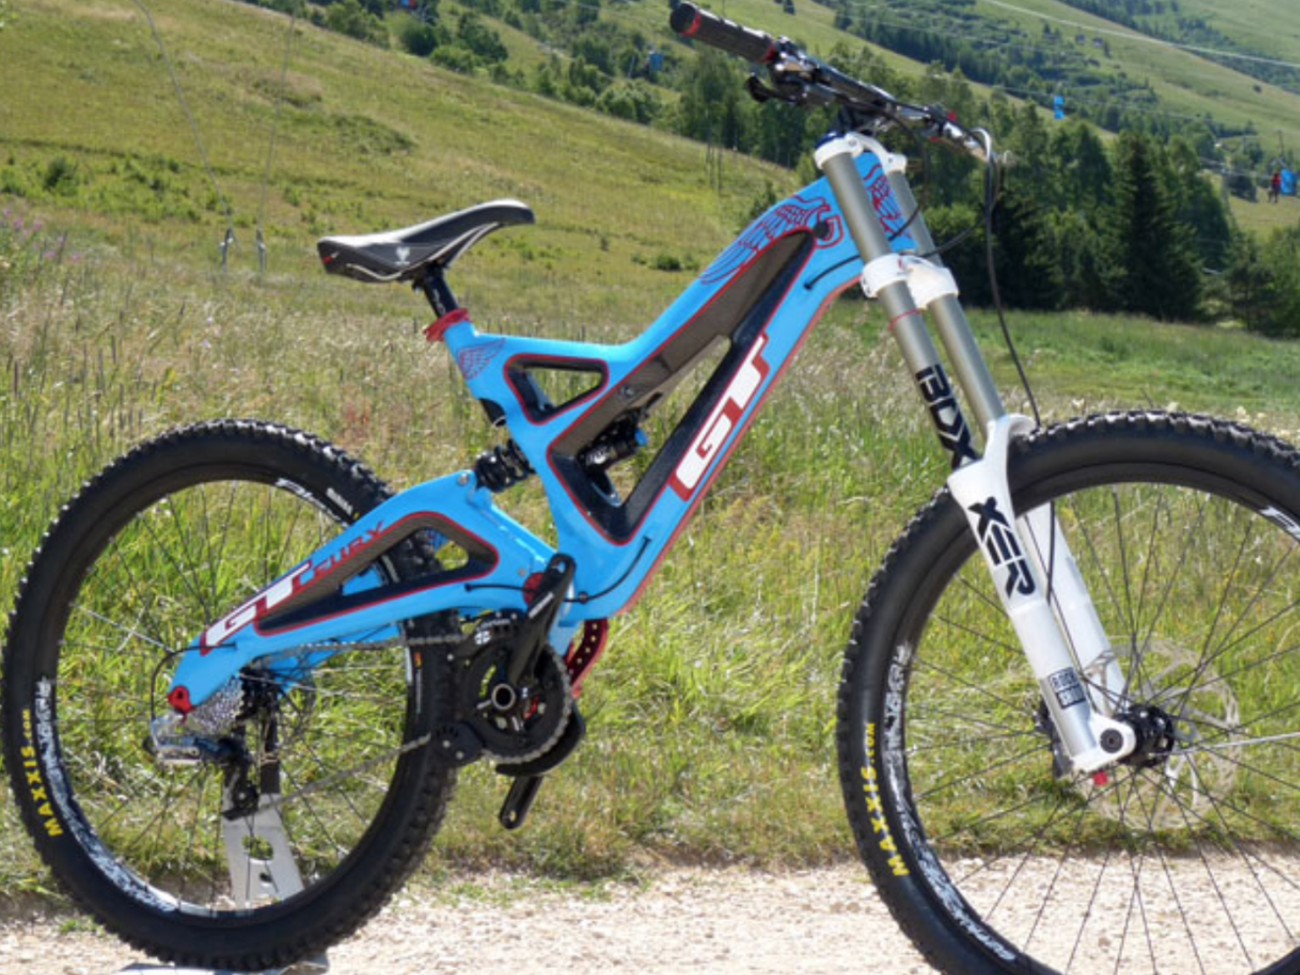 5d9256f4149 Rent Carbon Fiber GT Fury Downhill Mountain Bike in New York | Fat Llama